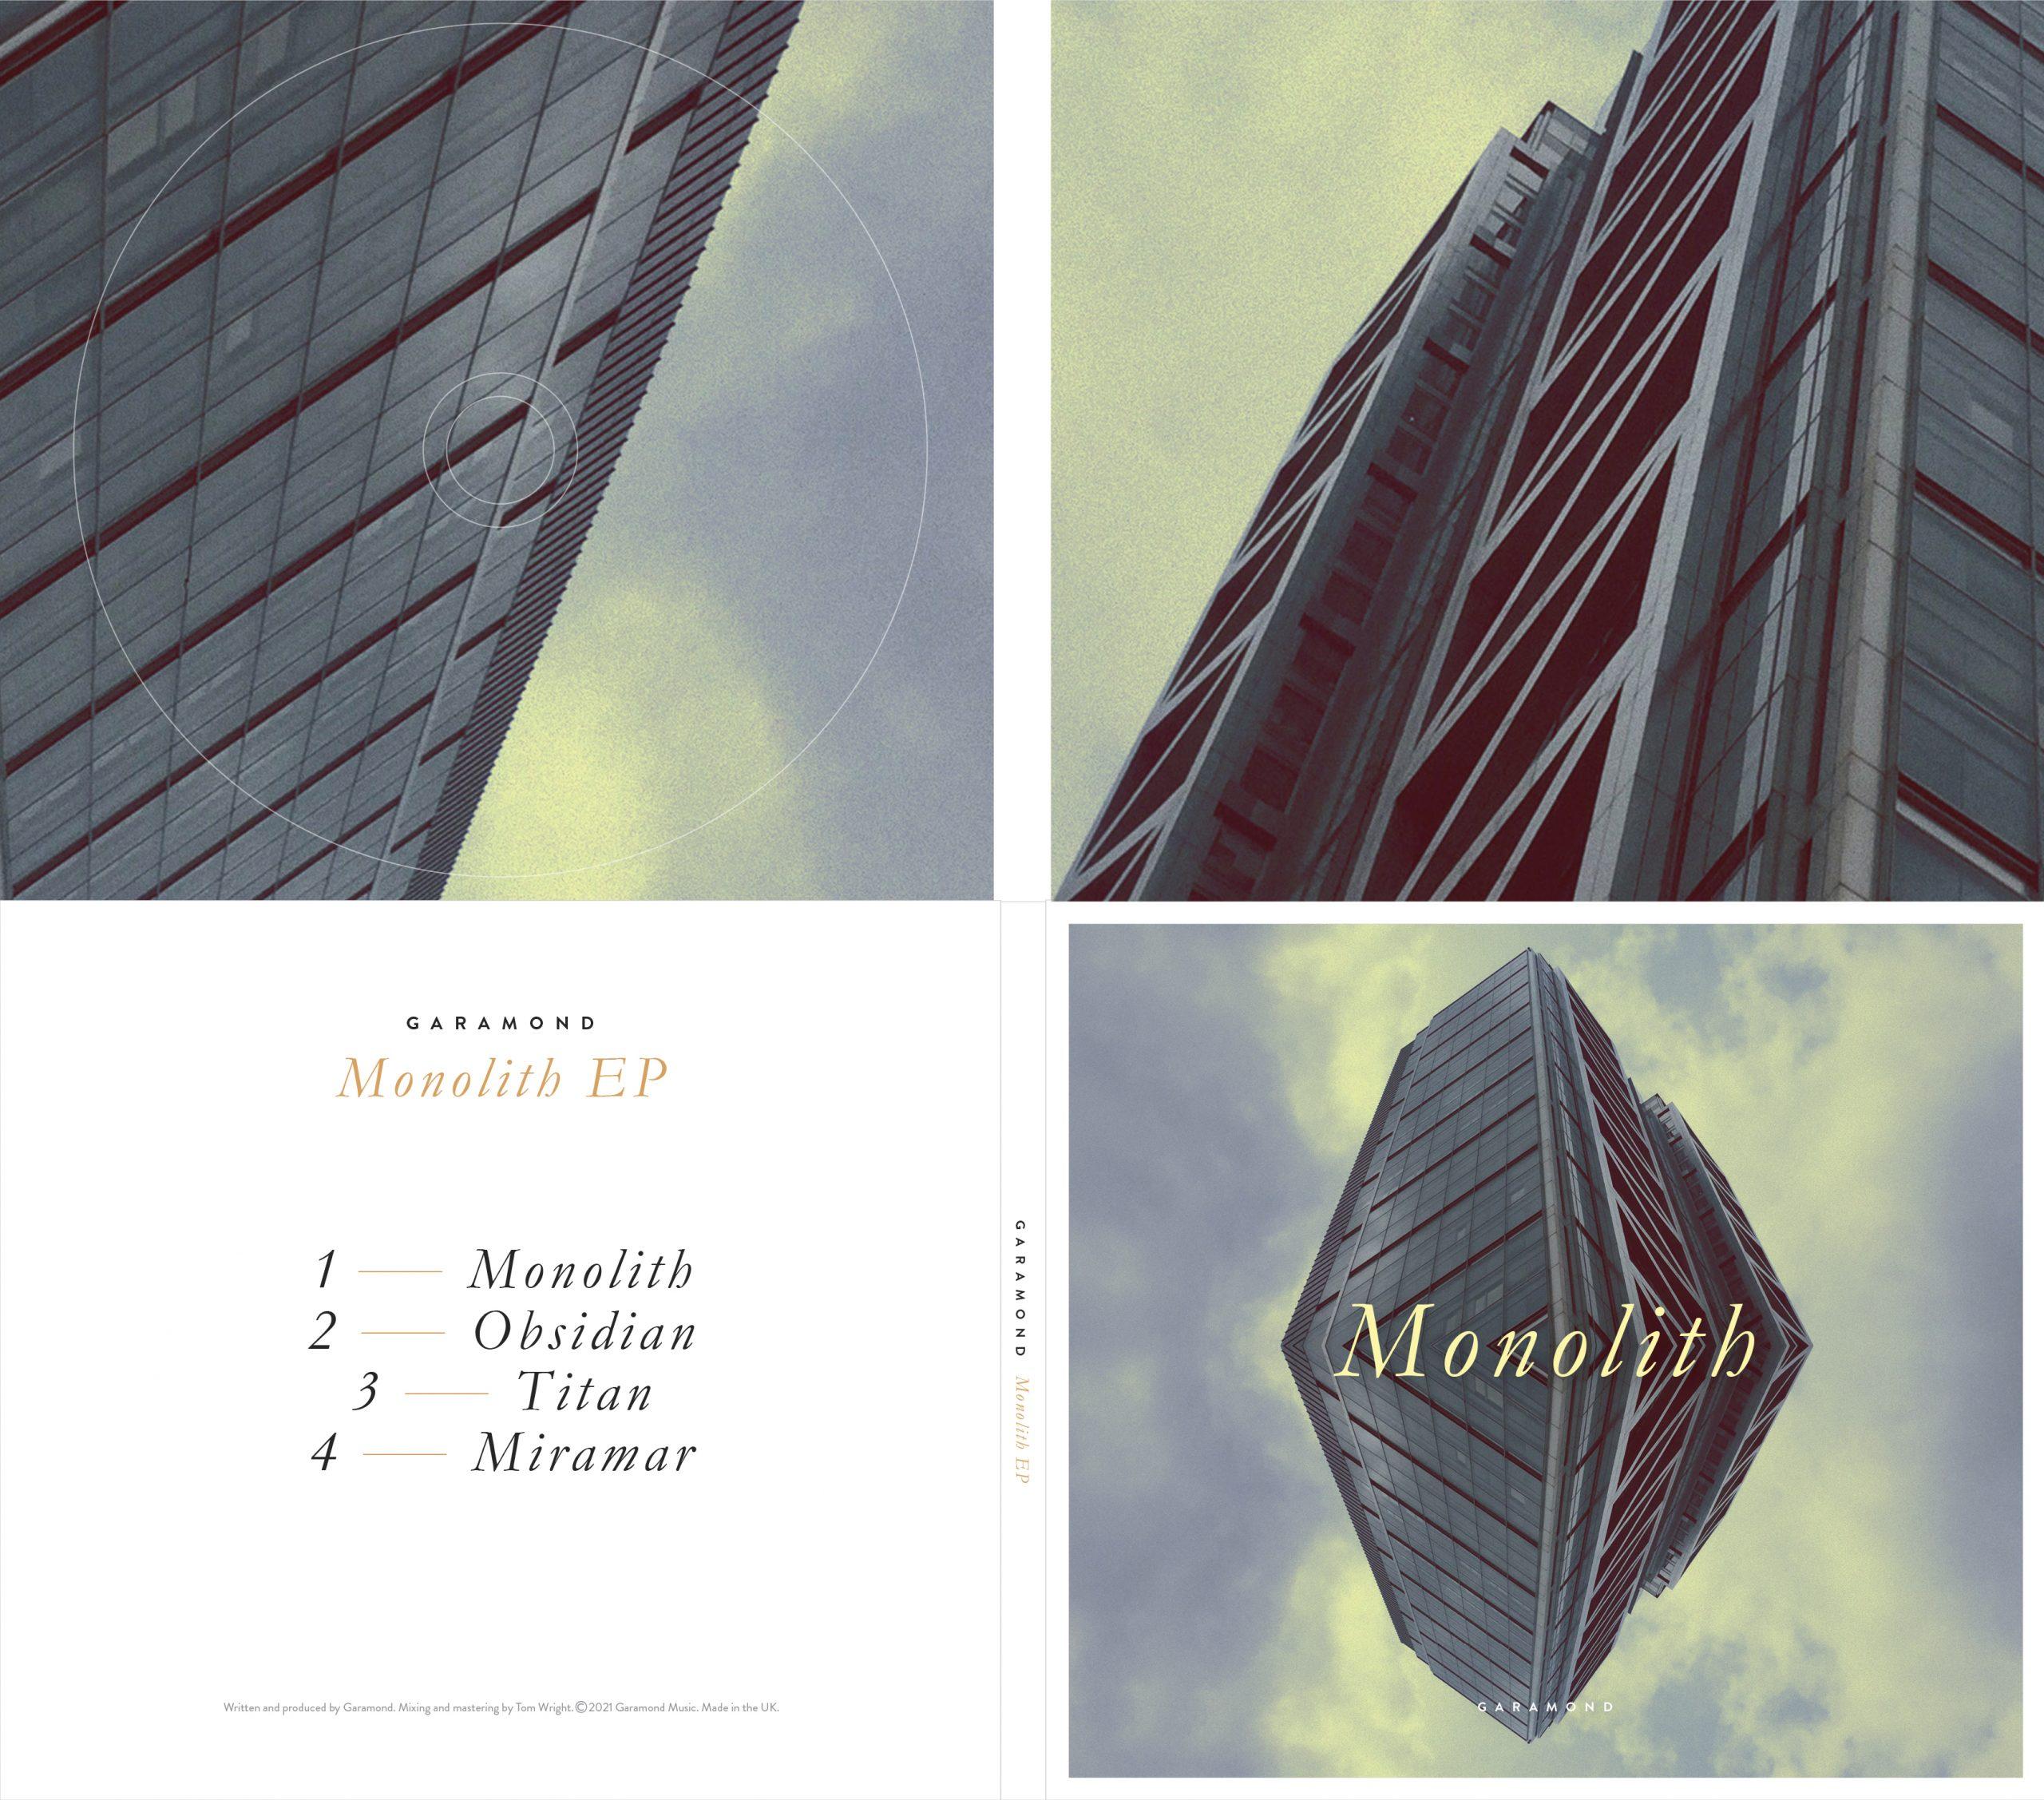 Garamond_Monolith-EP_4PAN1T_V3